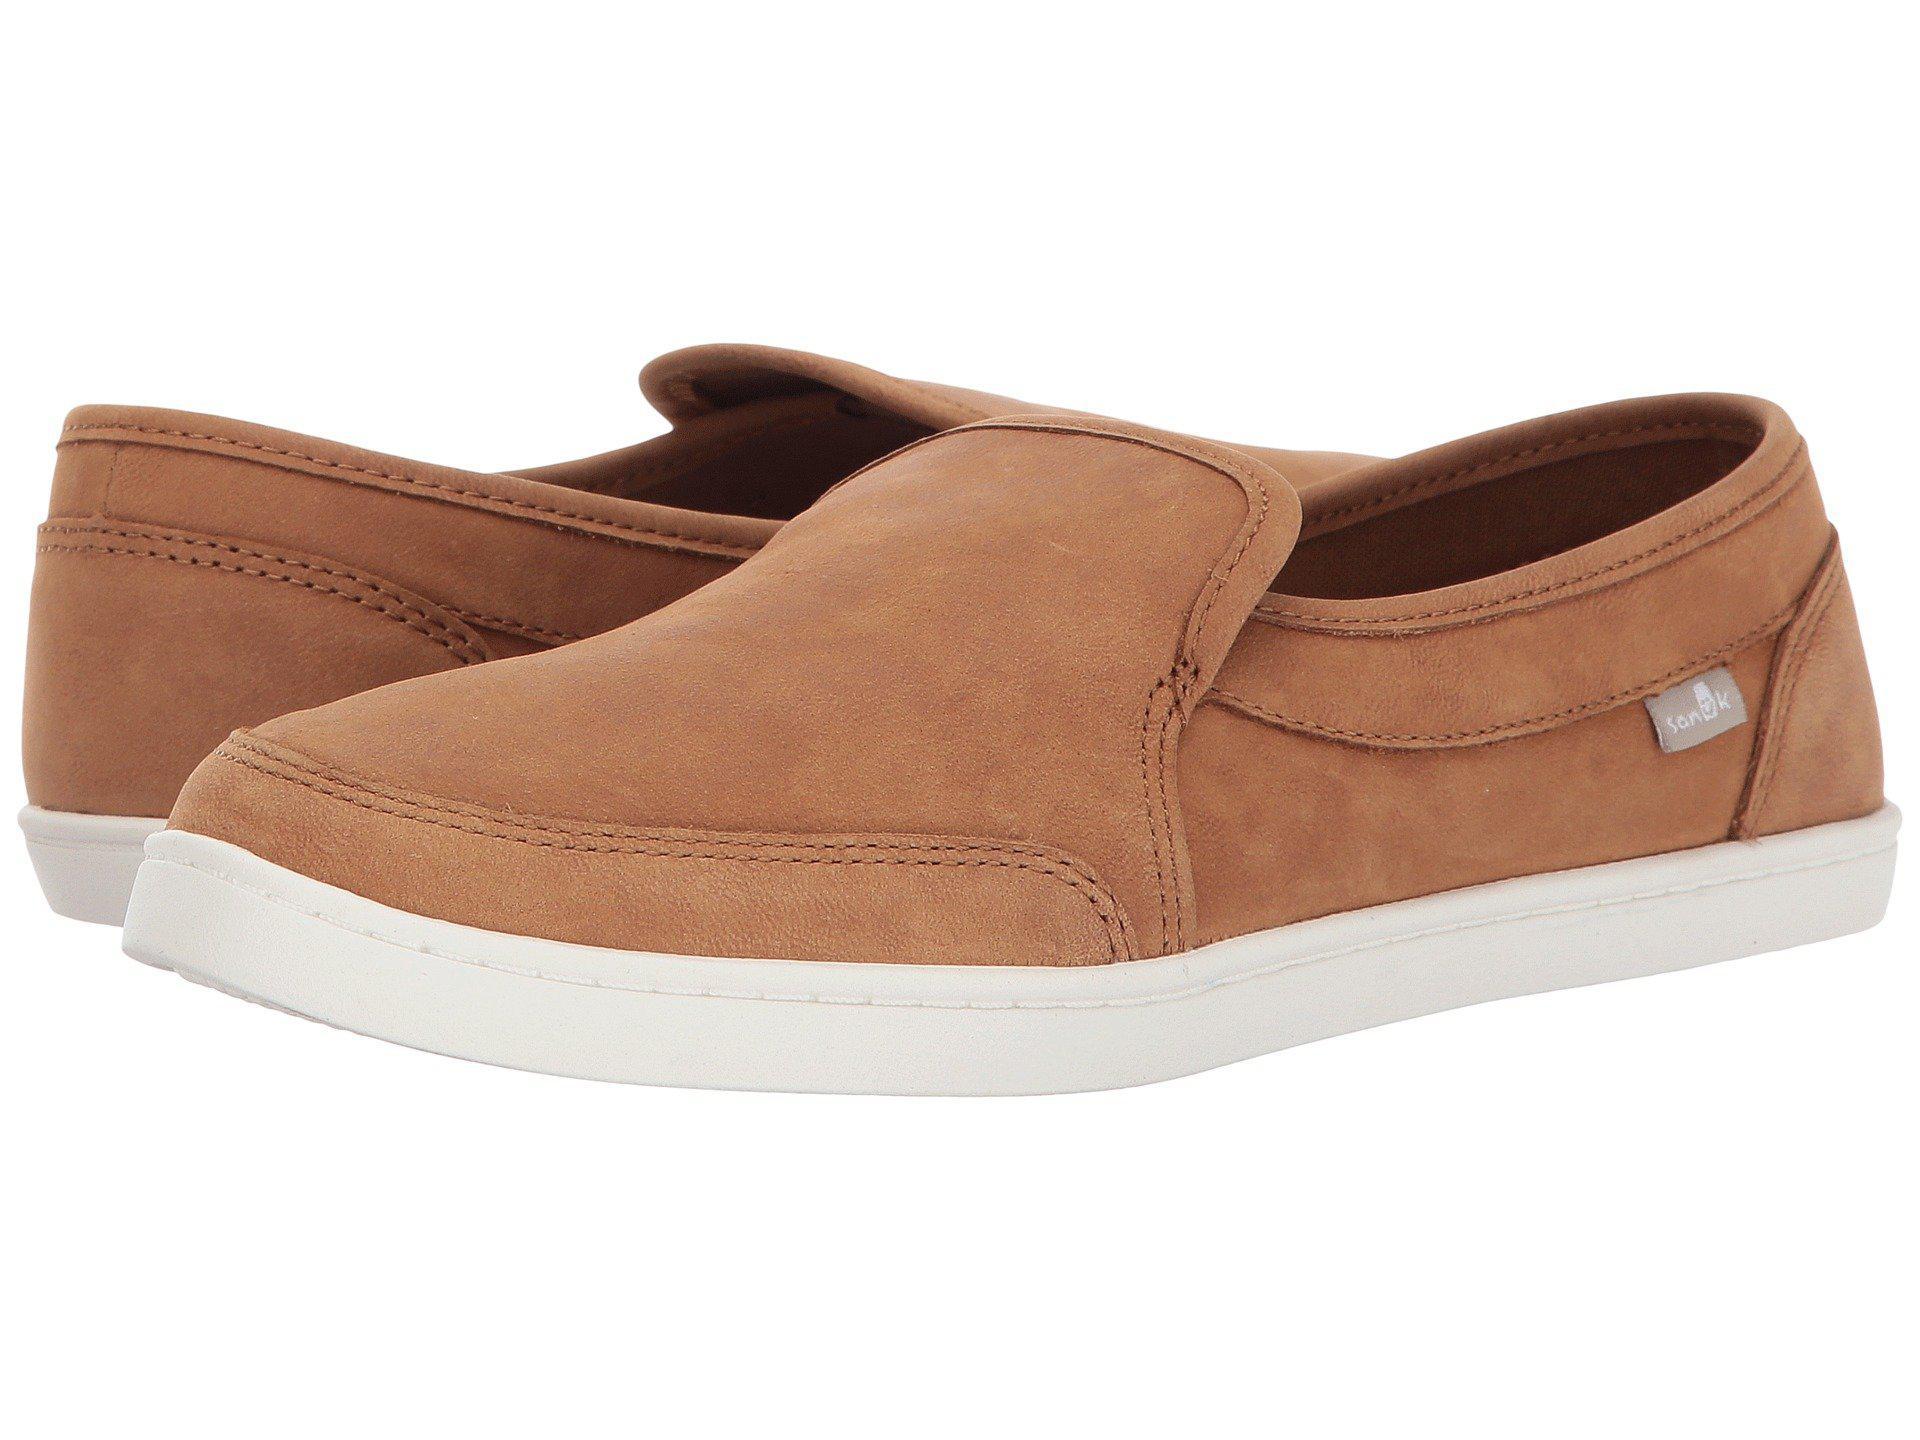 Sanuk Pair O Dice Leather Slip-On Shoes 1CXBRKE